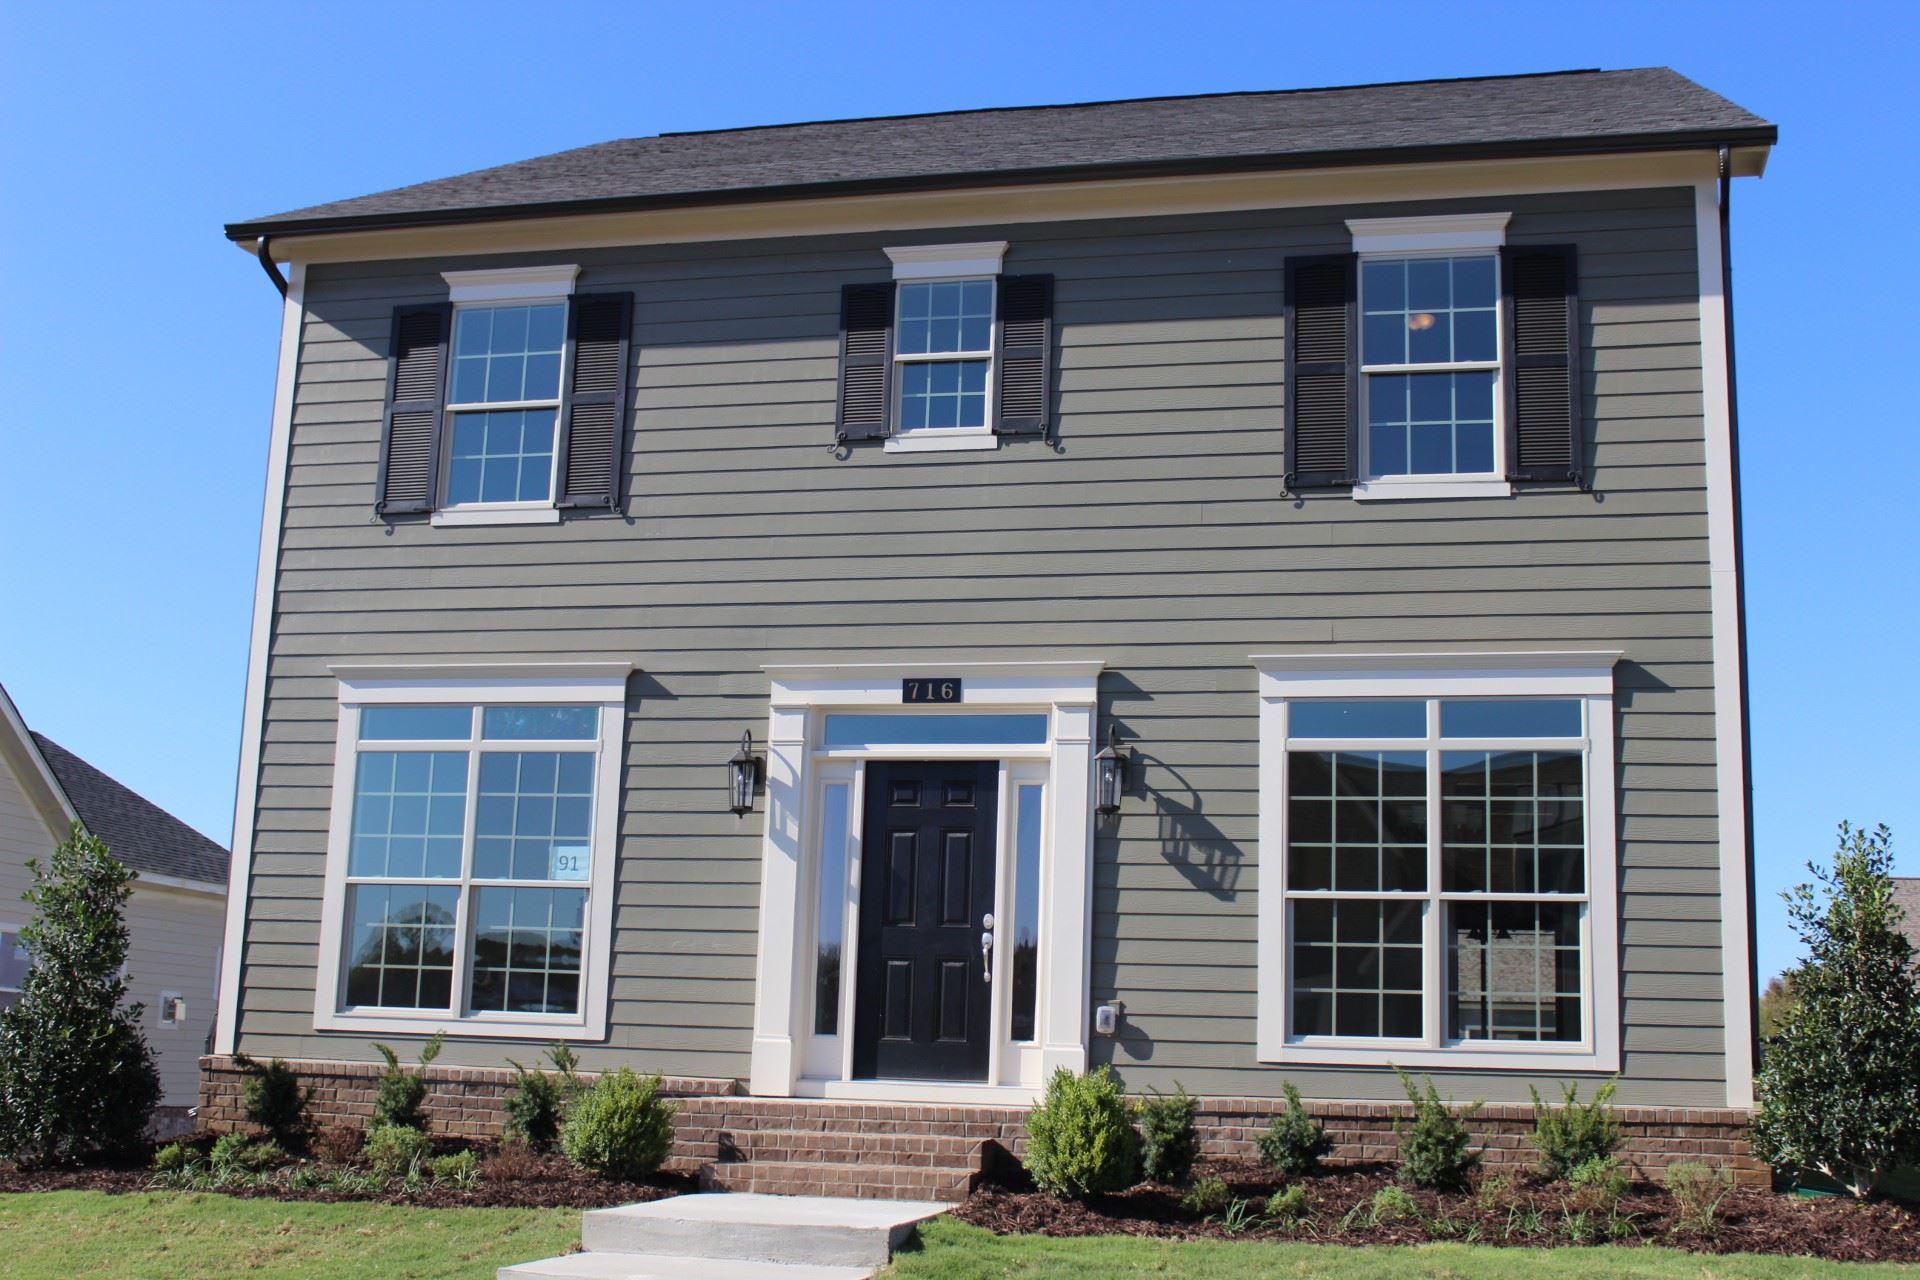 805 Ravensdowne Dr, Nolensville, TN 37135 - MLS#: 2161233